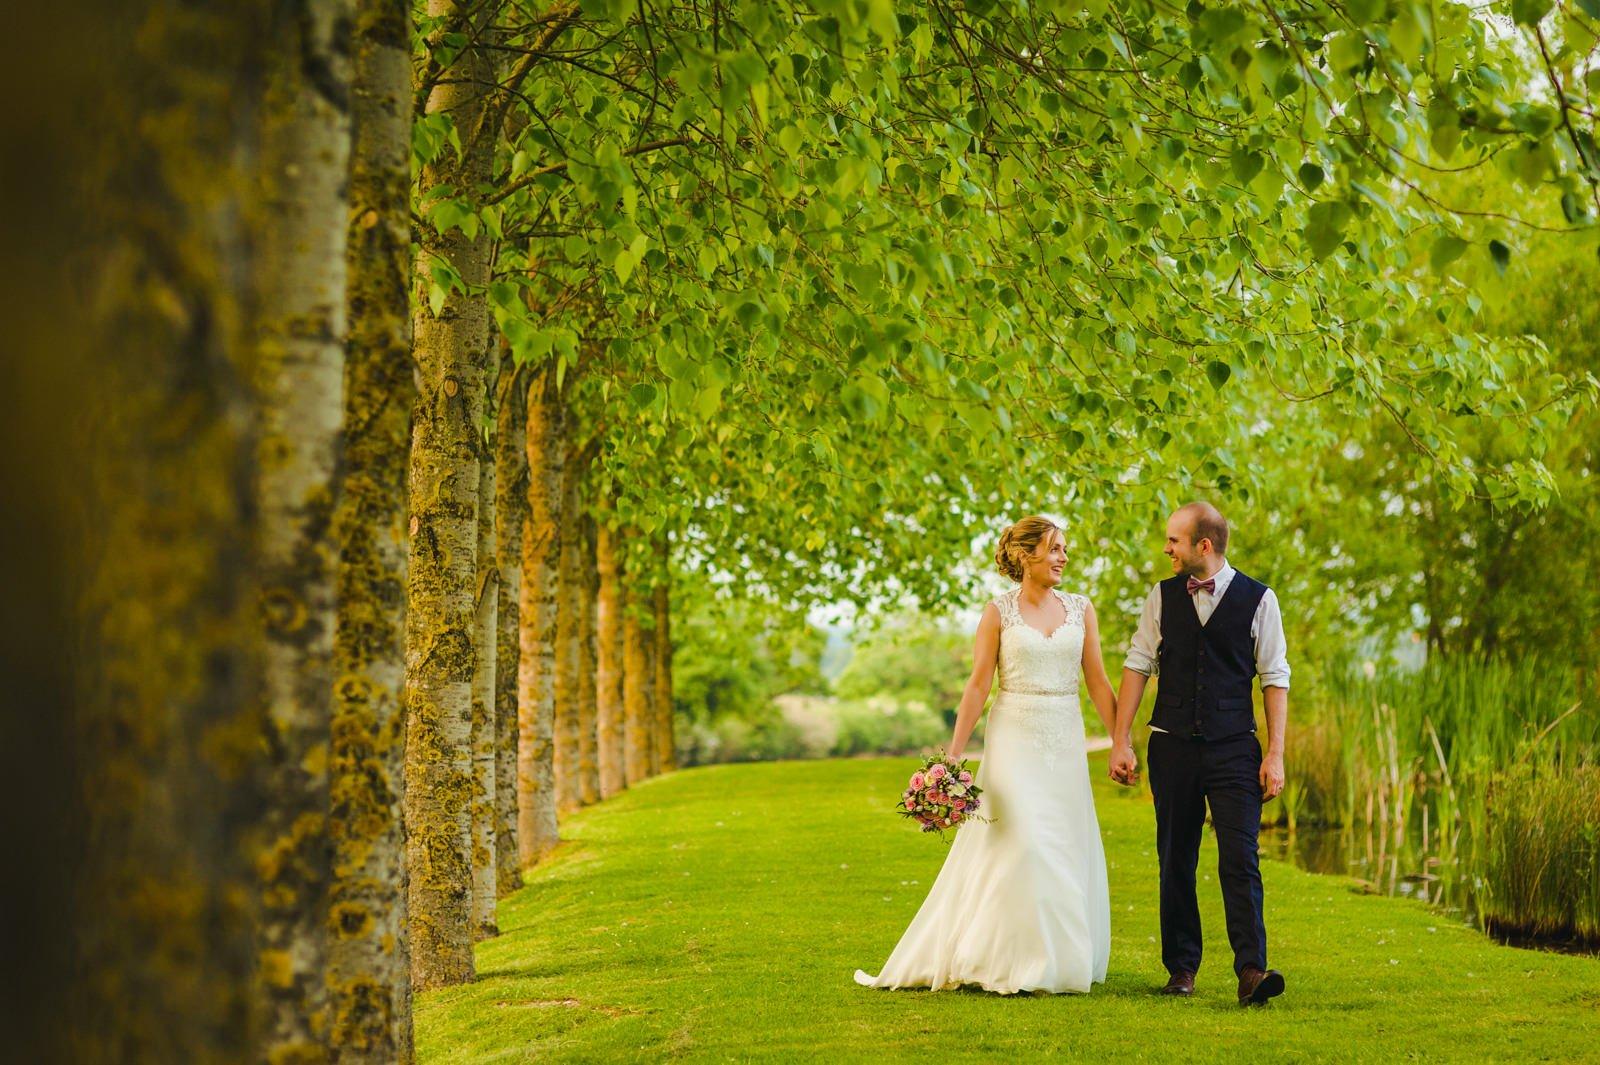 Millers Of Netley wedding, Dorrington, Shrewsbury | Emma + Ben 90